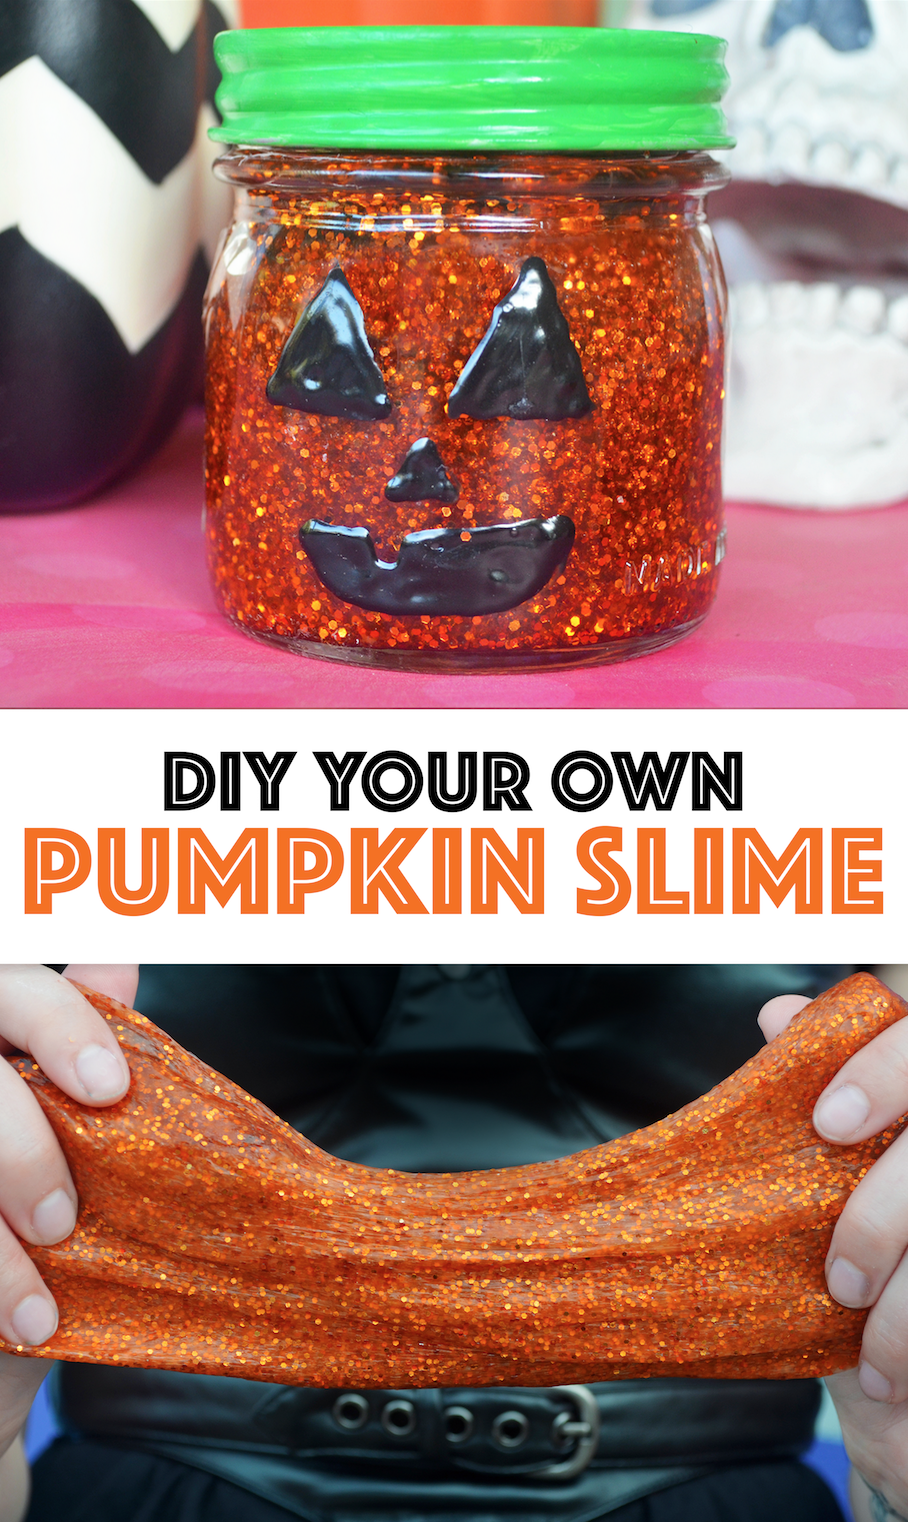 diy-your-own-pumpkin-slme